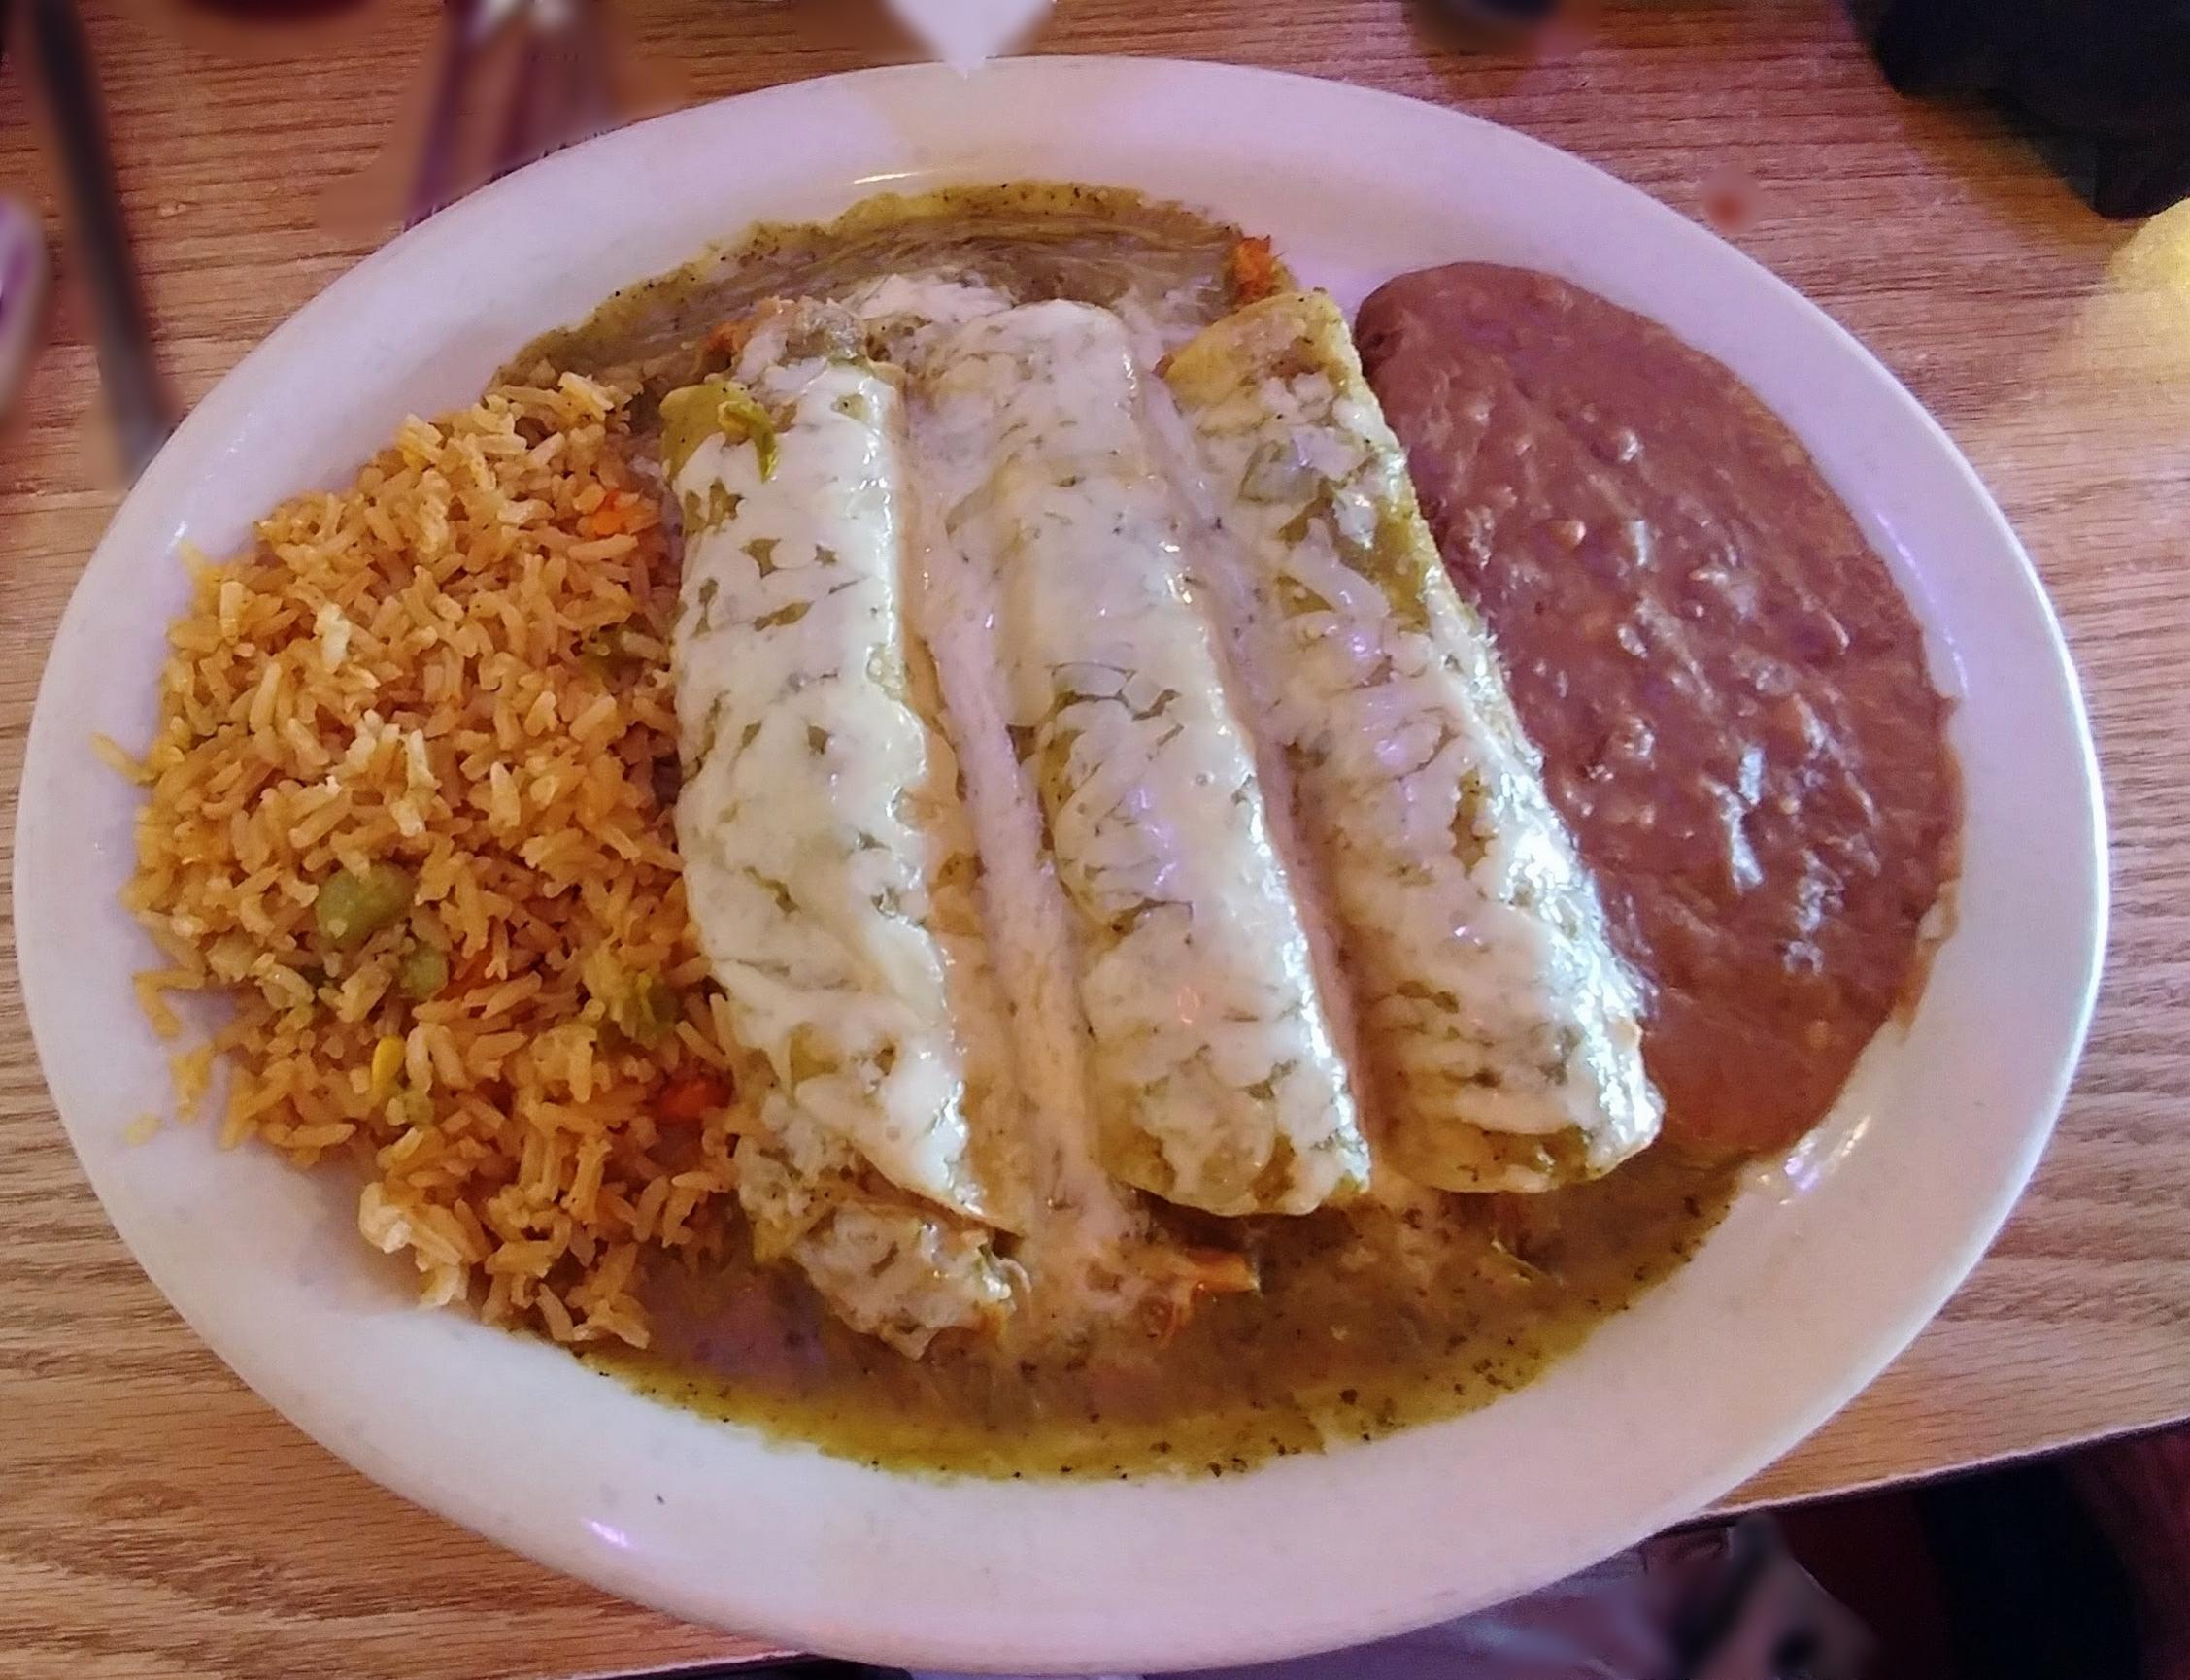 Chicken Enchiladas - with tomatillo sauce